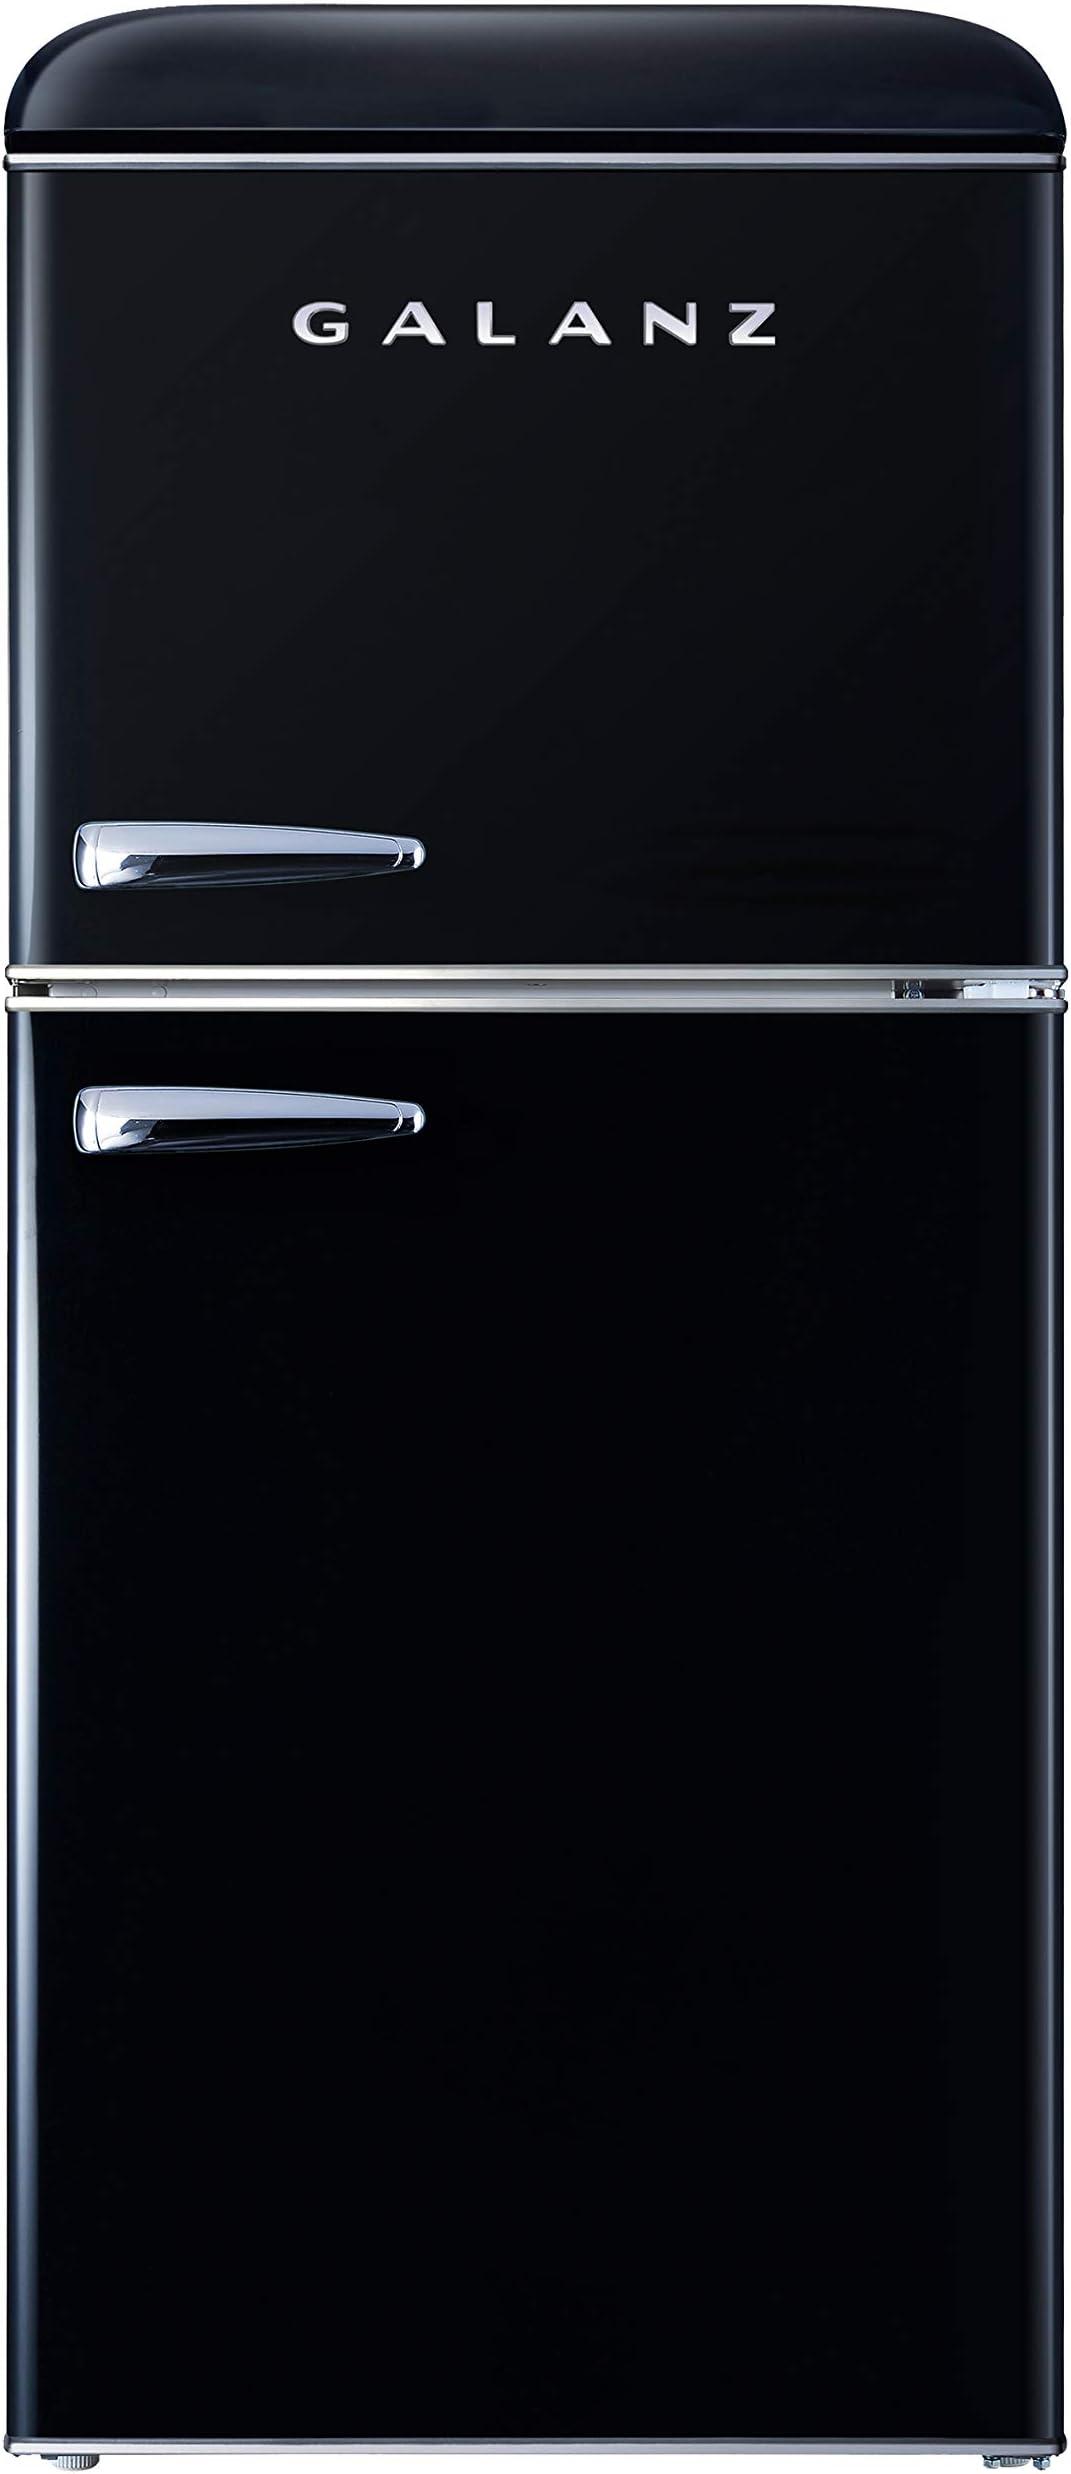 Galanz GLR40TBKER Retro Compact Refrigerator, Mini Fridge with Dual Doors, Adjustable Mechanical Thermostat with True Freezer, 4.0 Cu Ft, Black